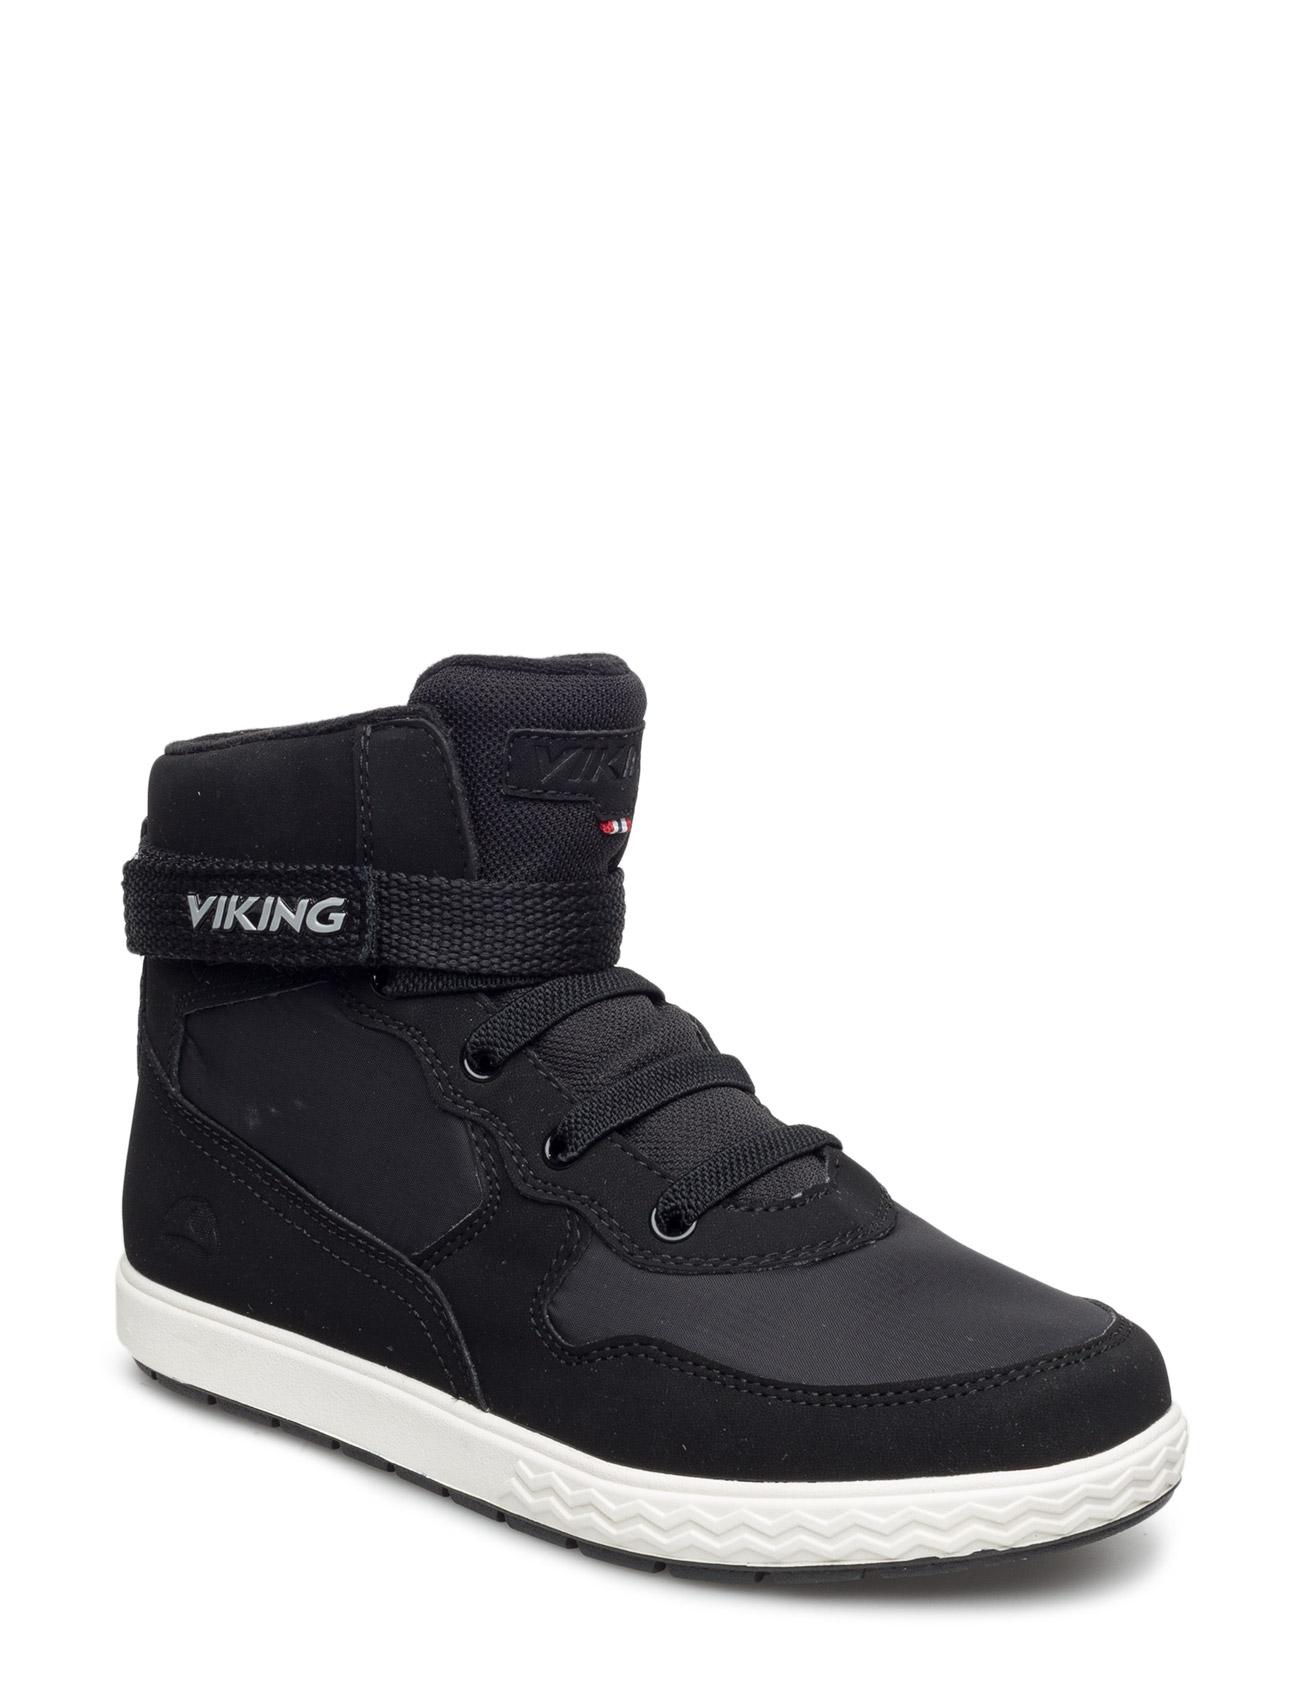 Vigra Gtx Viking Sko & Sneakers til Børn i Sort